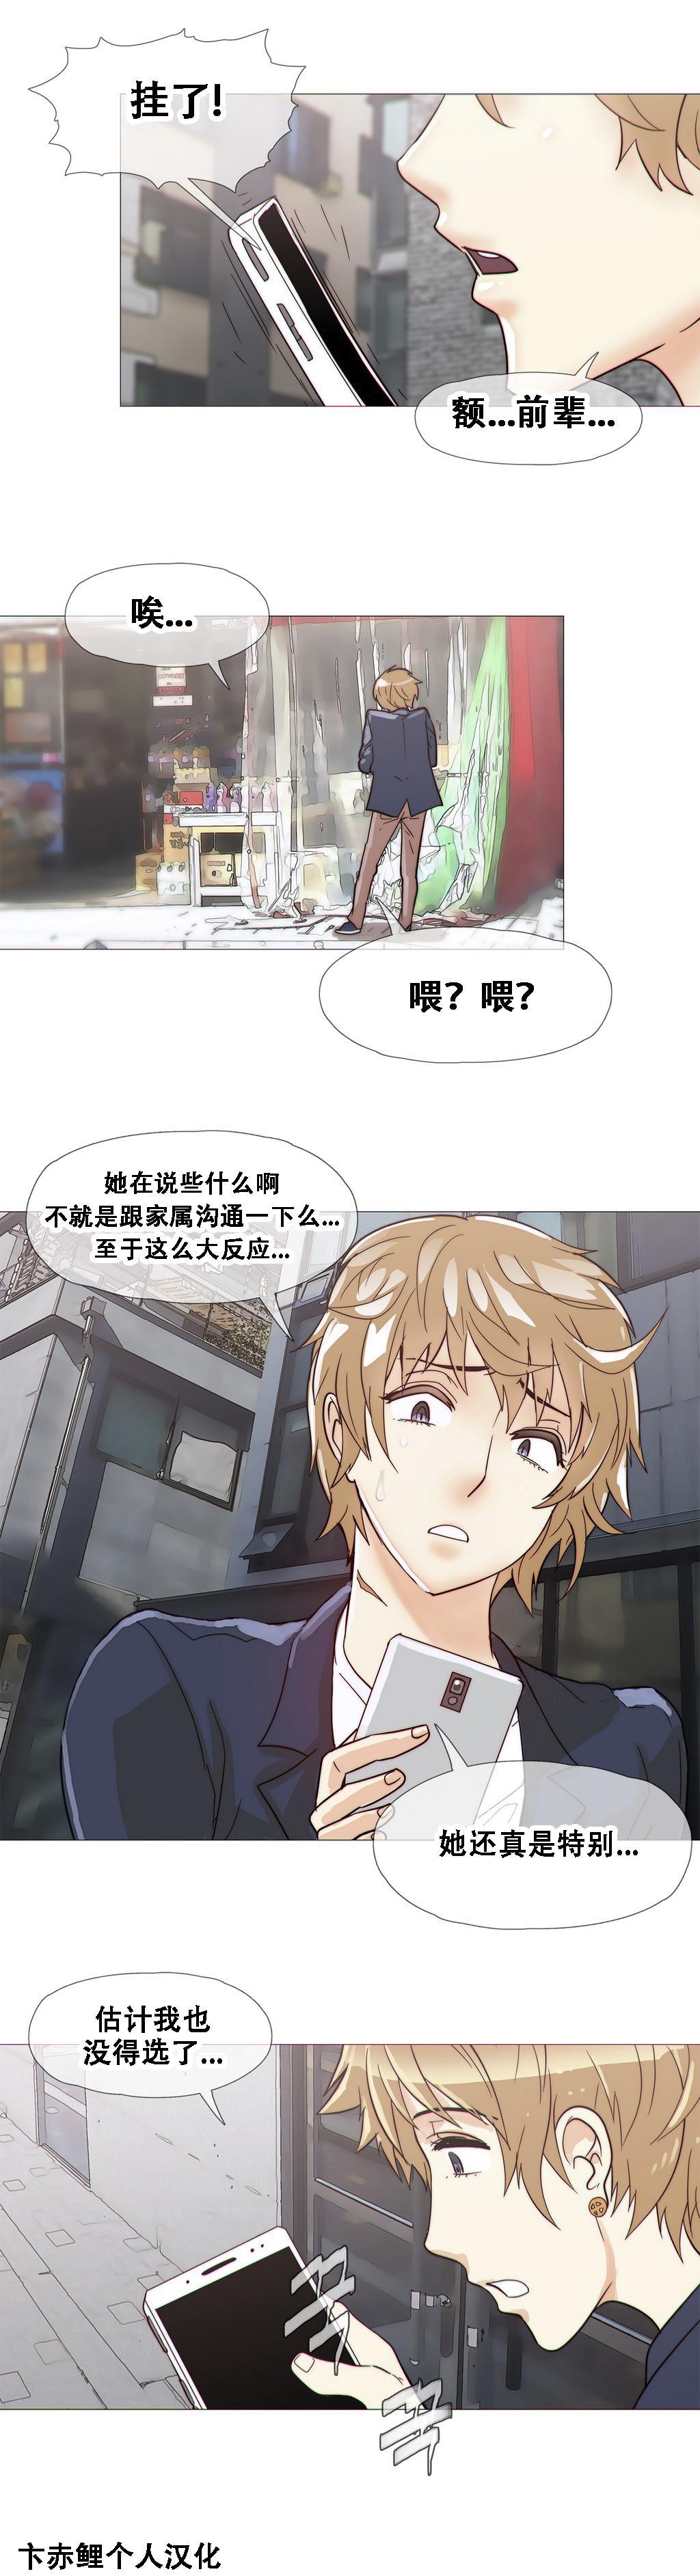 HouseHold Affairs 【卞赤鲤个人汉化】1~21话(持续更新中) 411